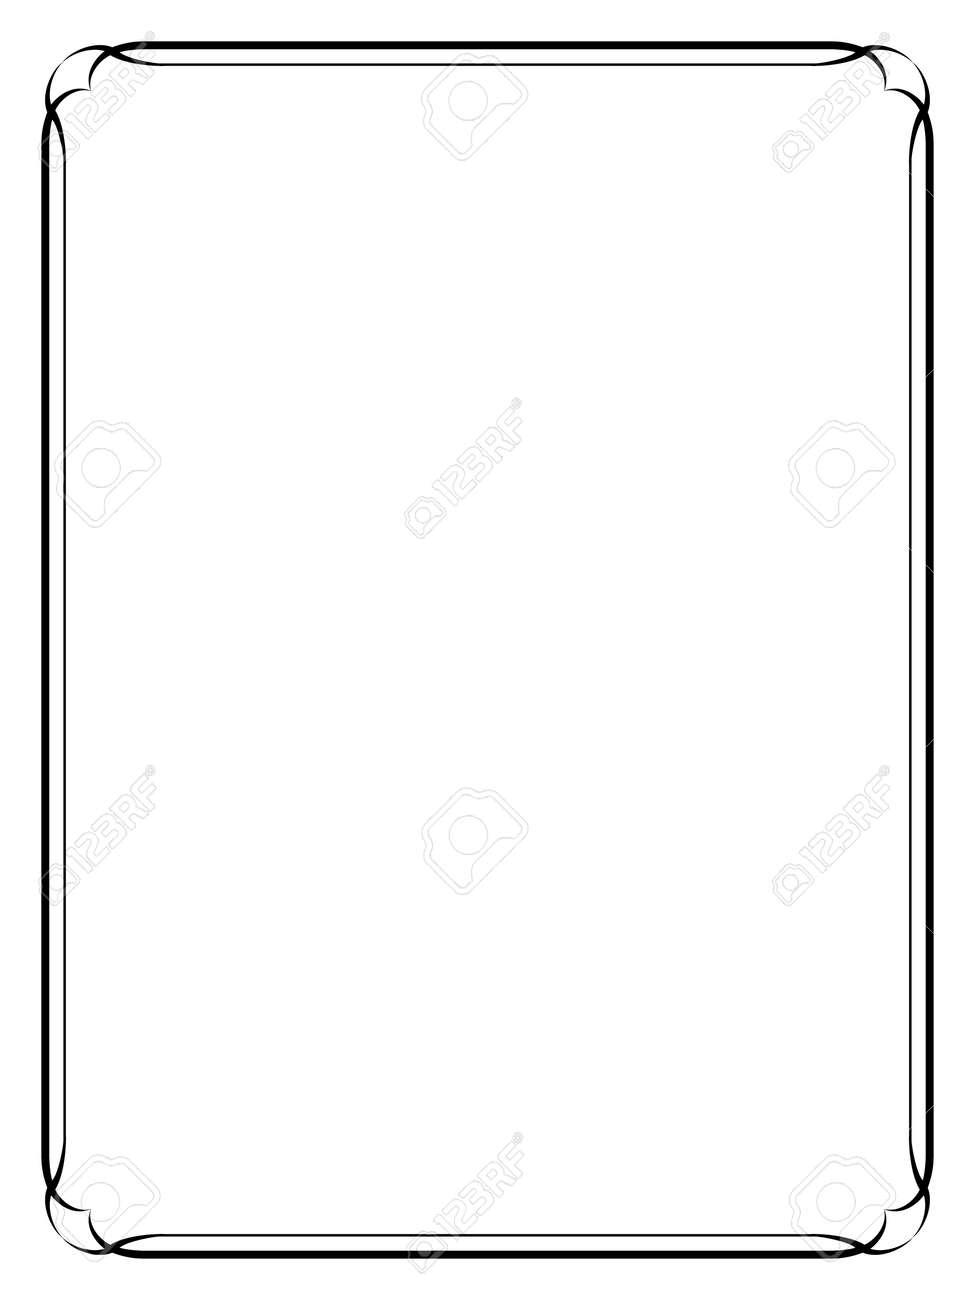 simple calligraph black ornamental decorative frame - 158226765